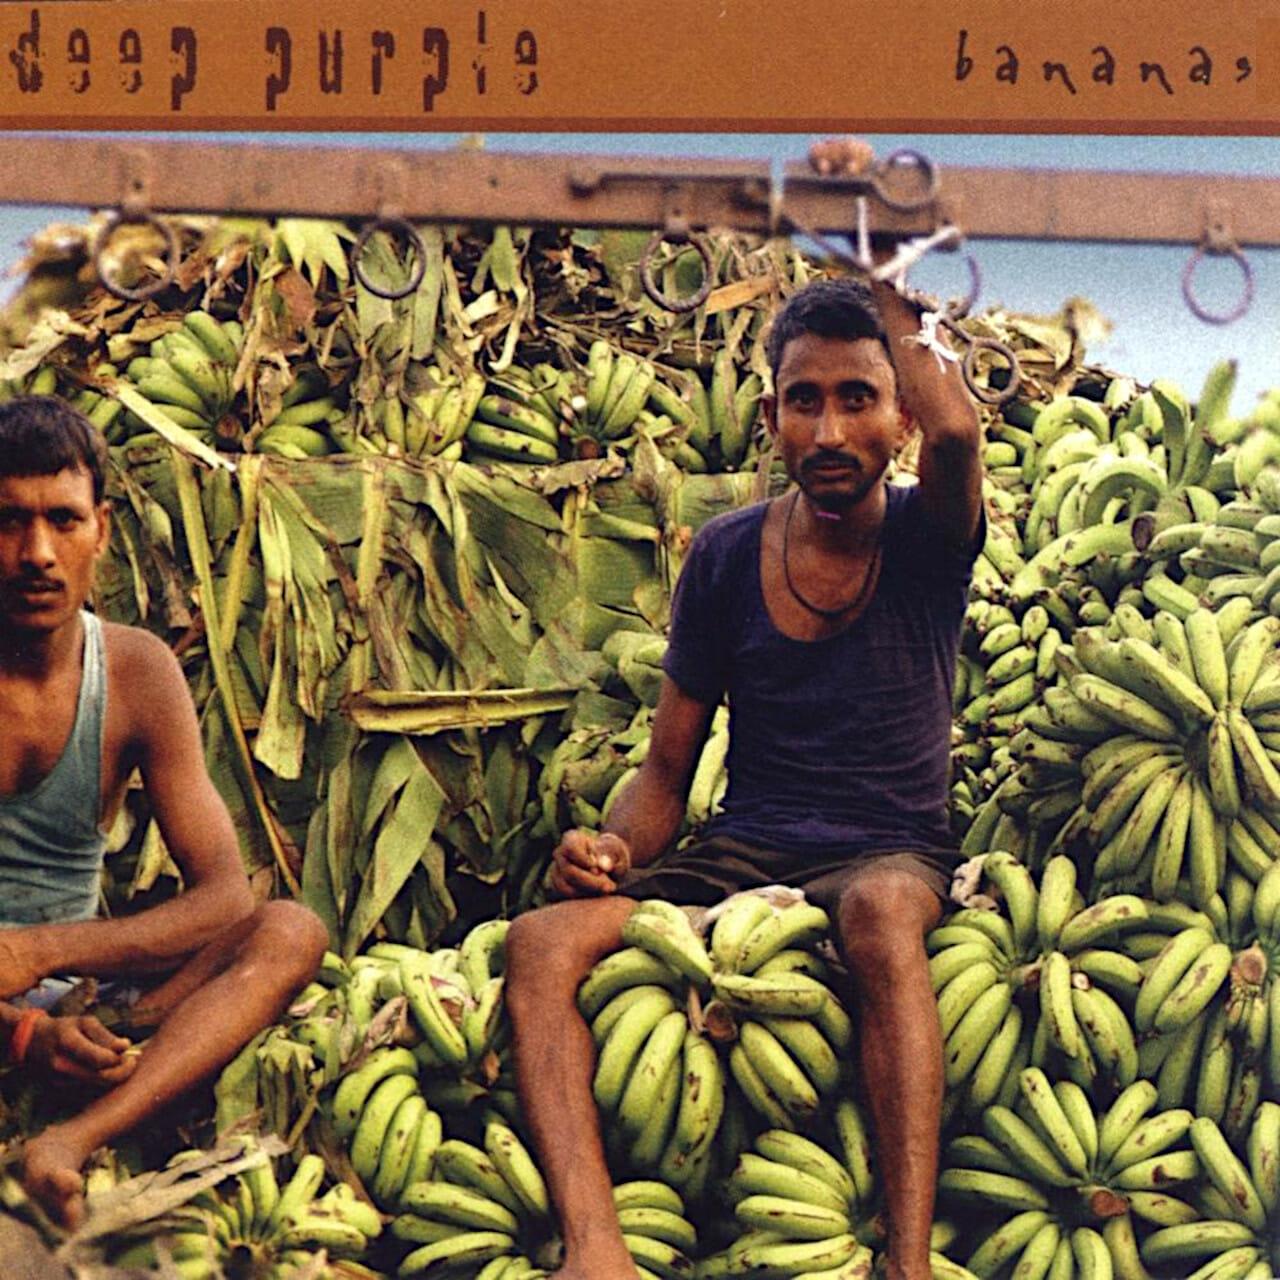 Deep Purple Bananas